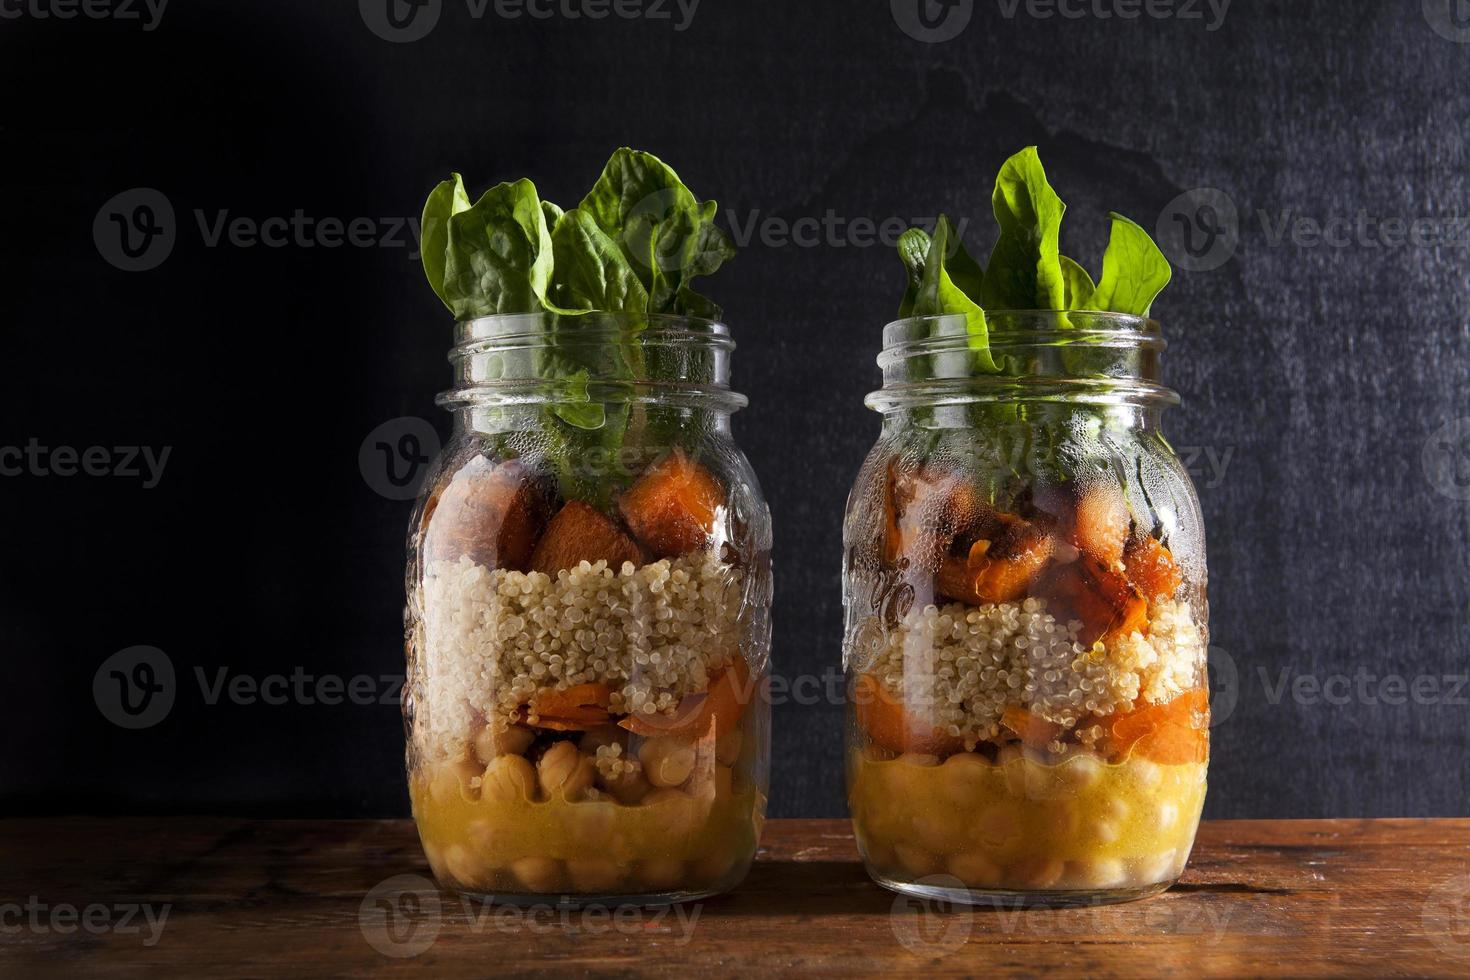 Mason jars with hot Salad: Chickpeas, arrots, quinoa, roasted Pu photo